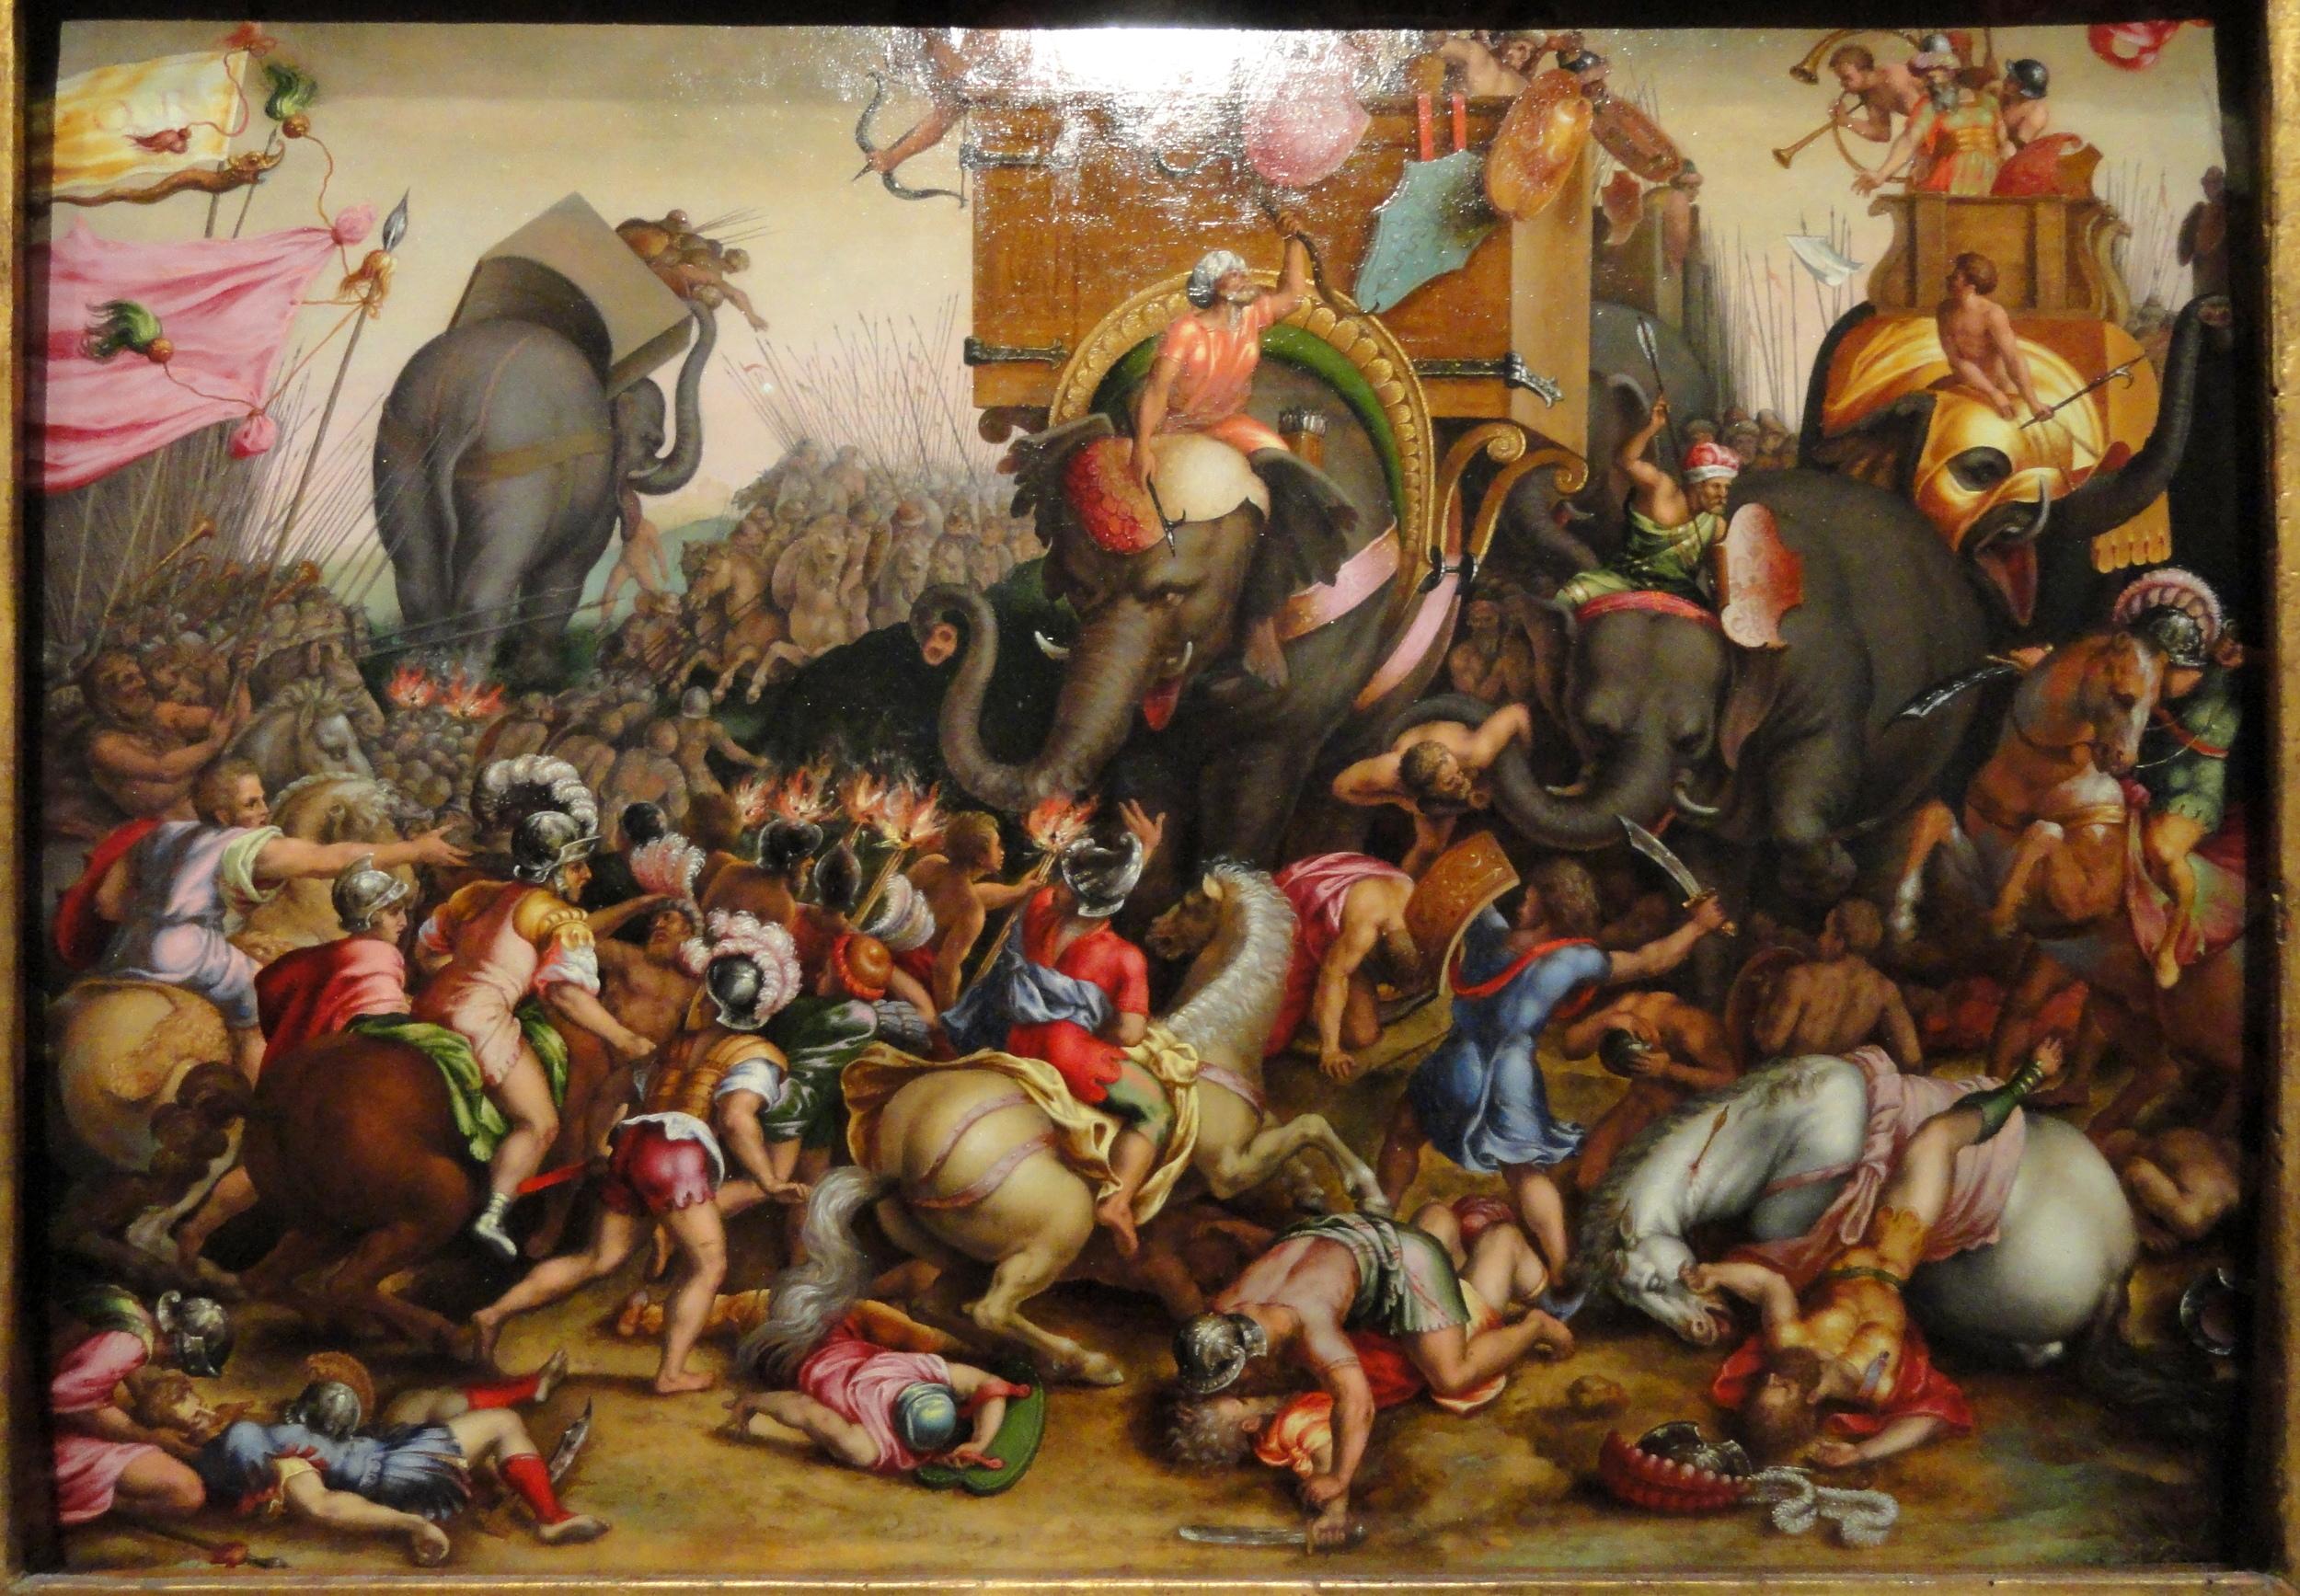 The Battle of Zama (202 BCE). Picture credit = artic.edu